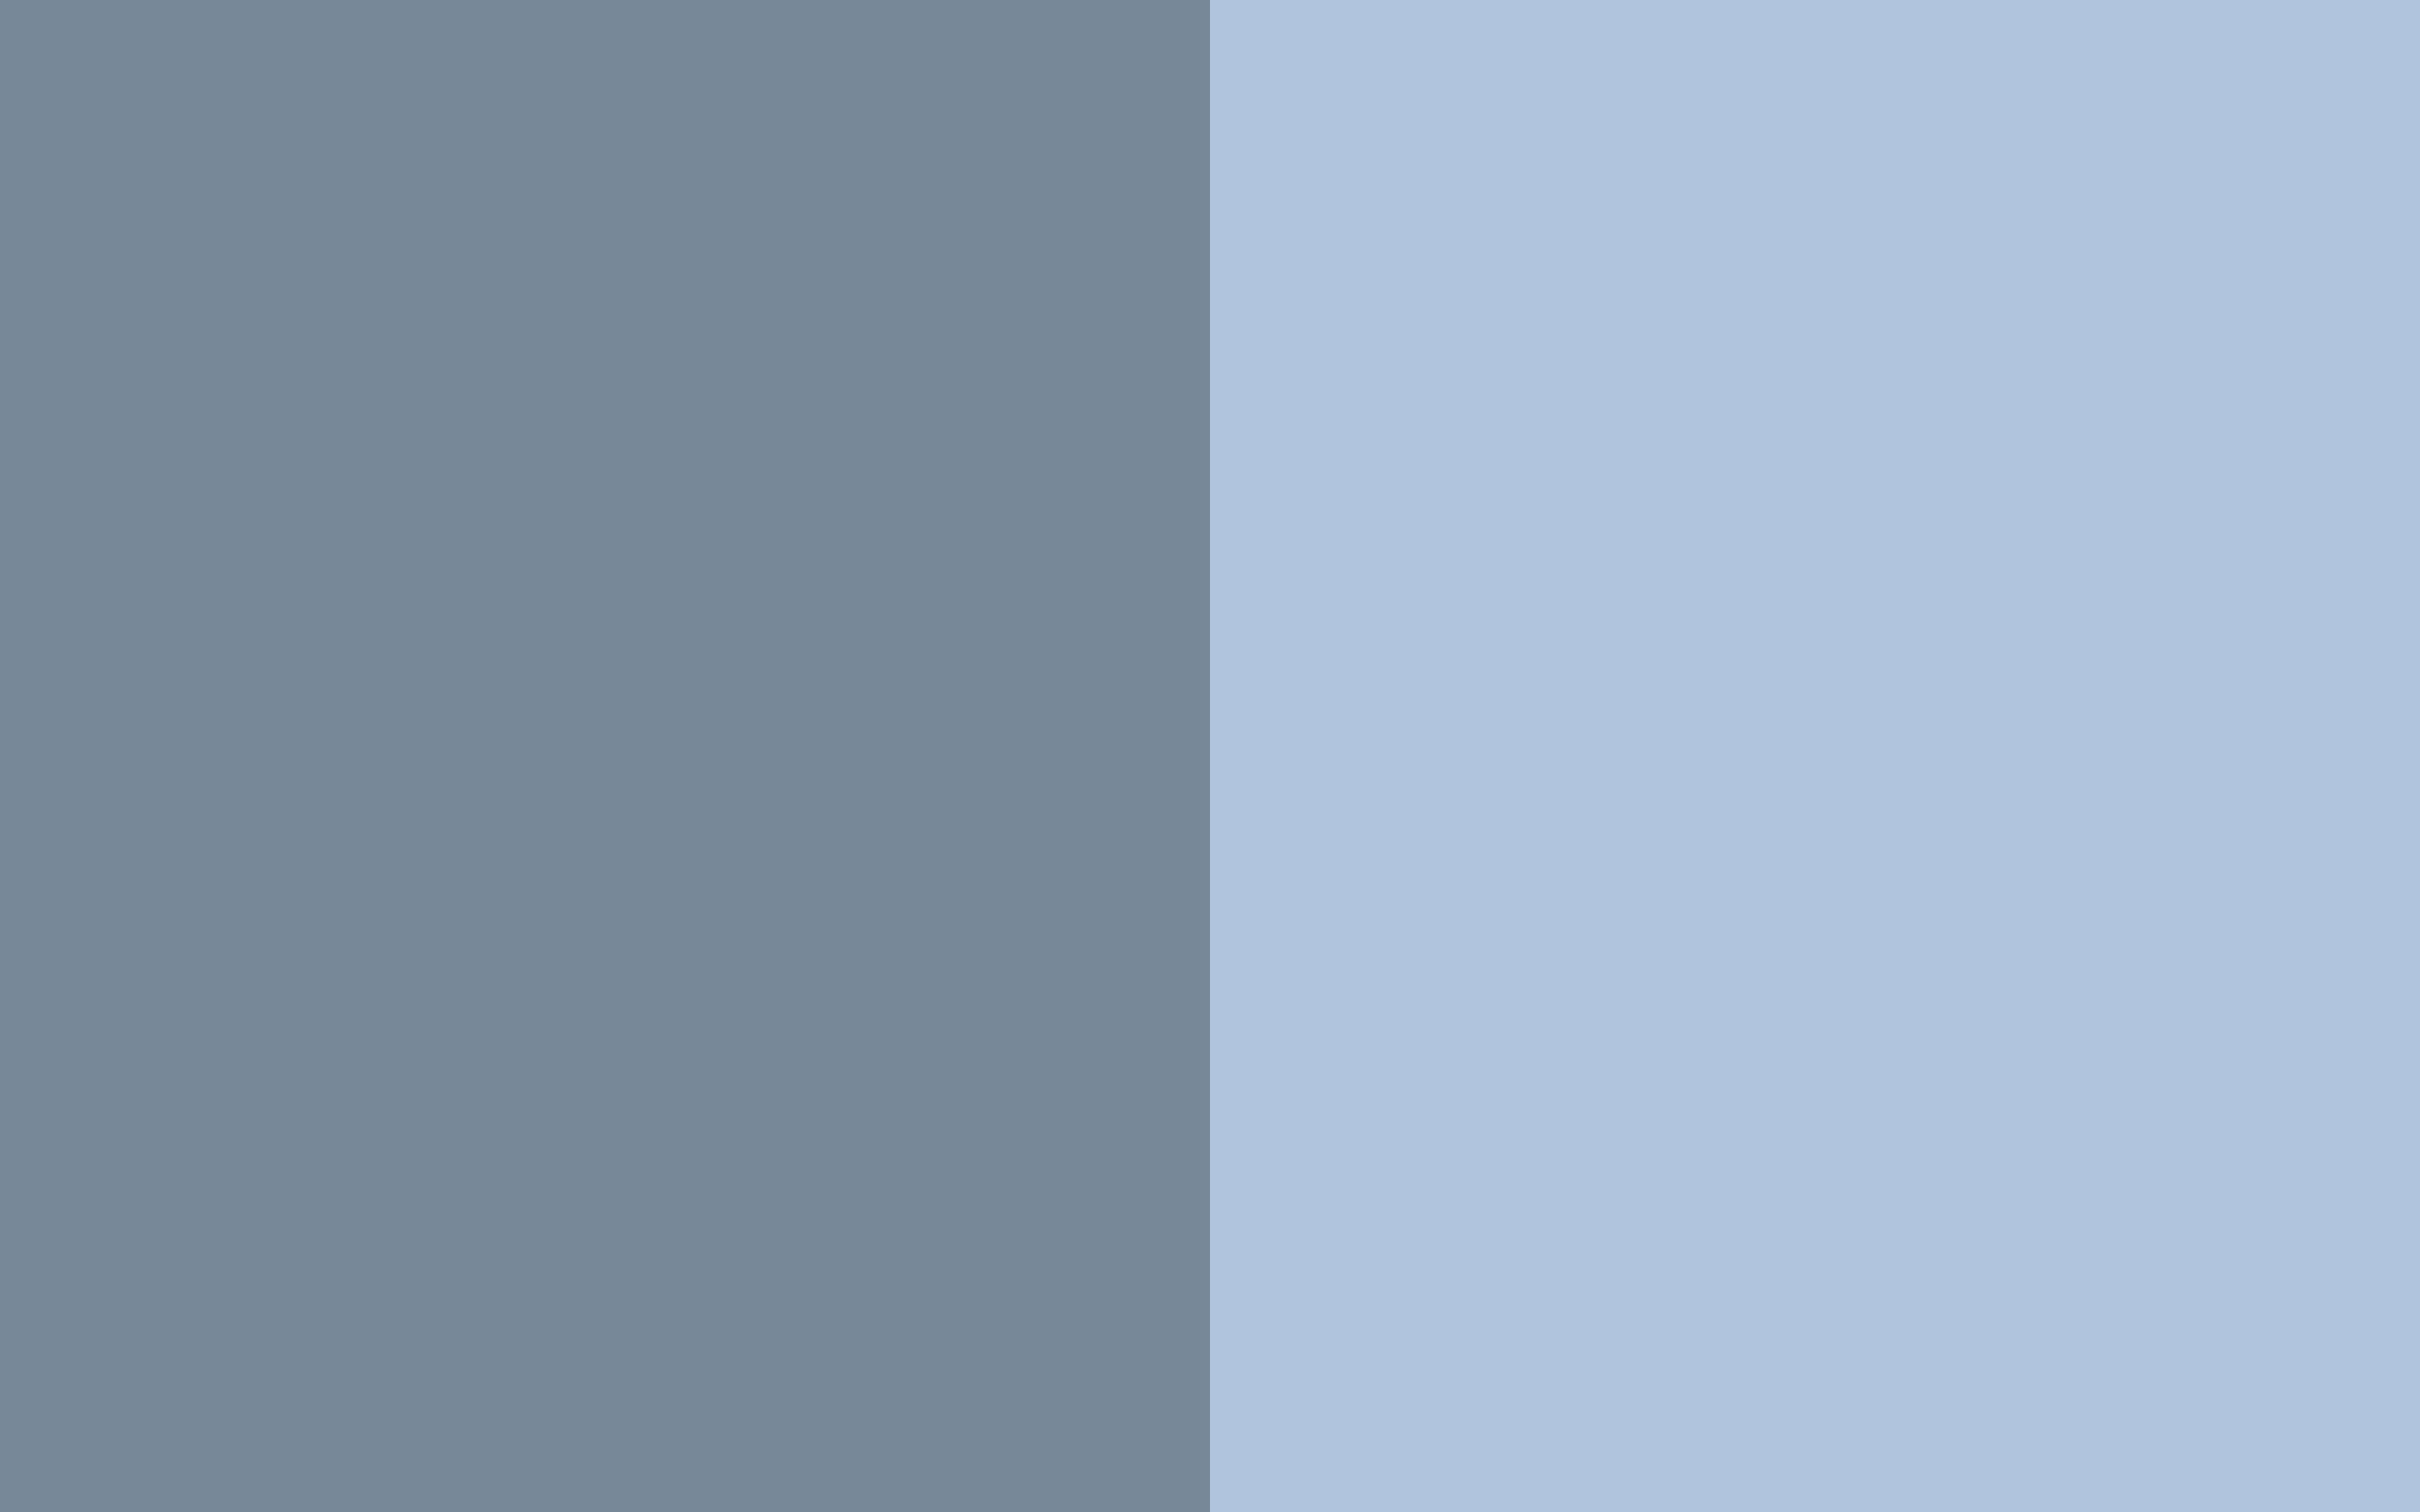 grey blue wallpaper wallpapersafari. Black Bedroom Furniture Sets. Home Design Ideas